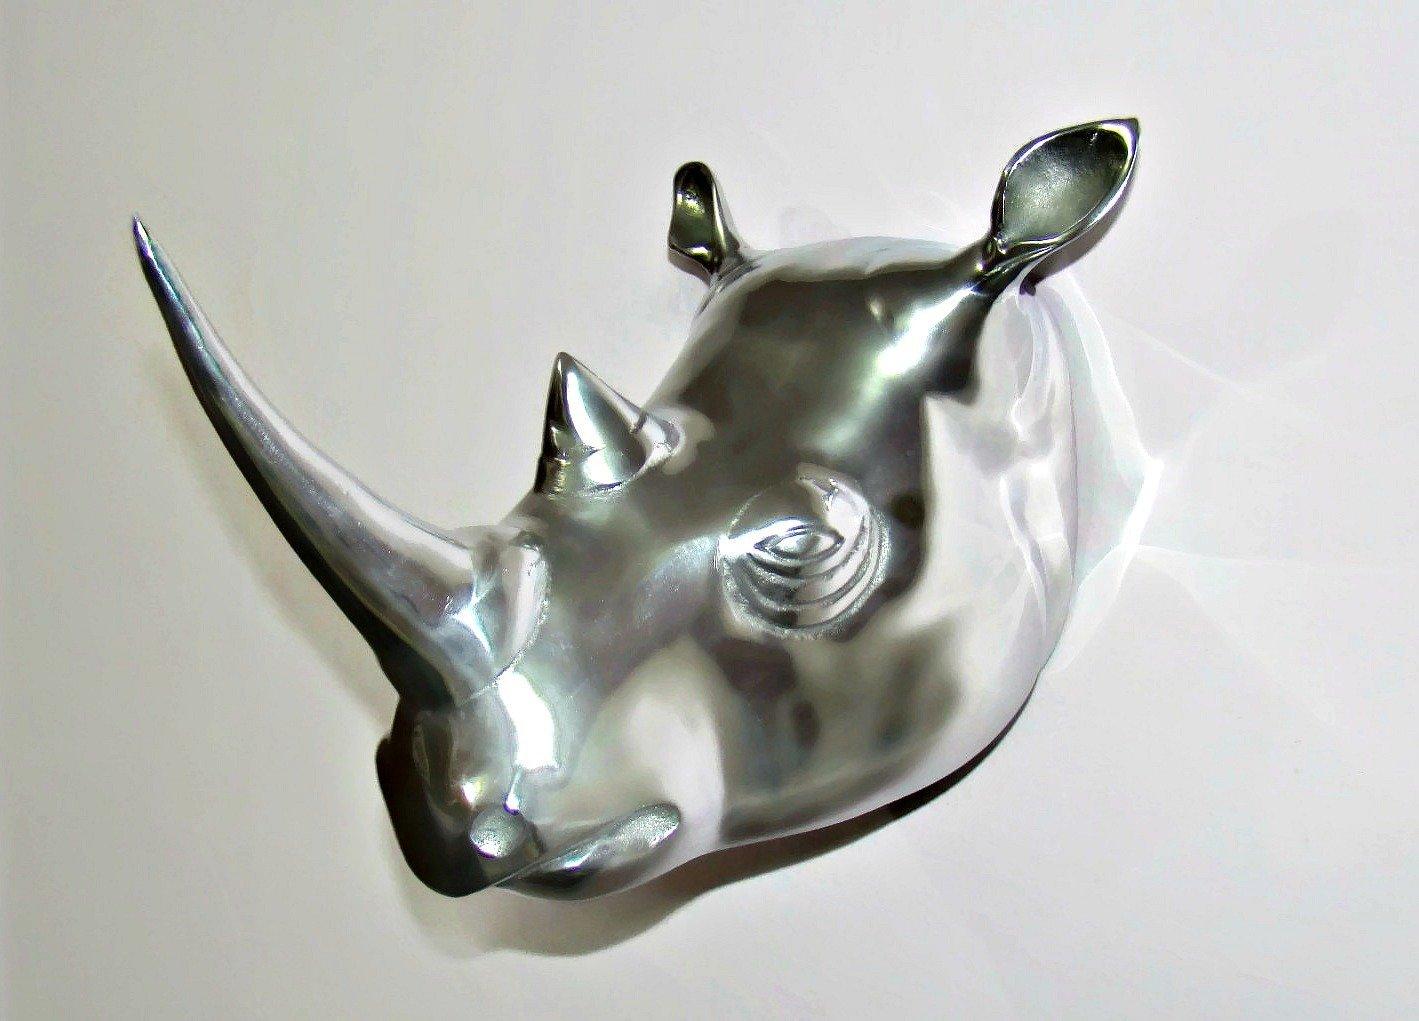 Craftvatika's LIFE SIZE taxidermy WALL MOUNTED Big Metal RHINO WALL HEAD Animal Sculpture Figurine Rhinoceros Faux (Silver Finish) craftvatika